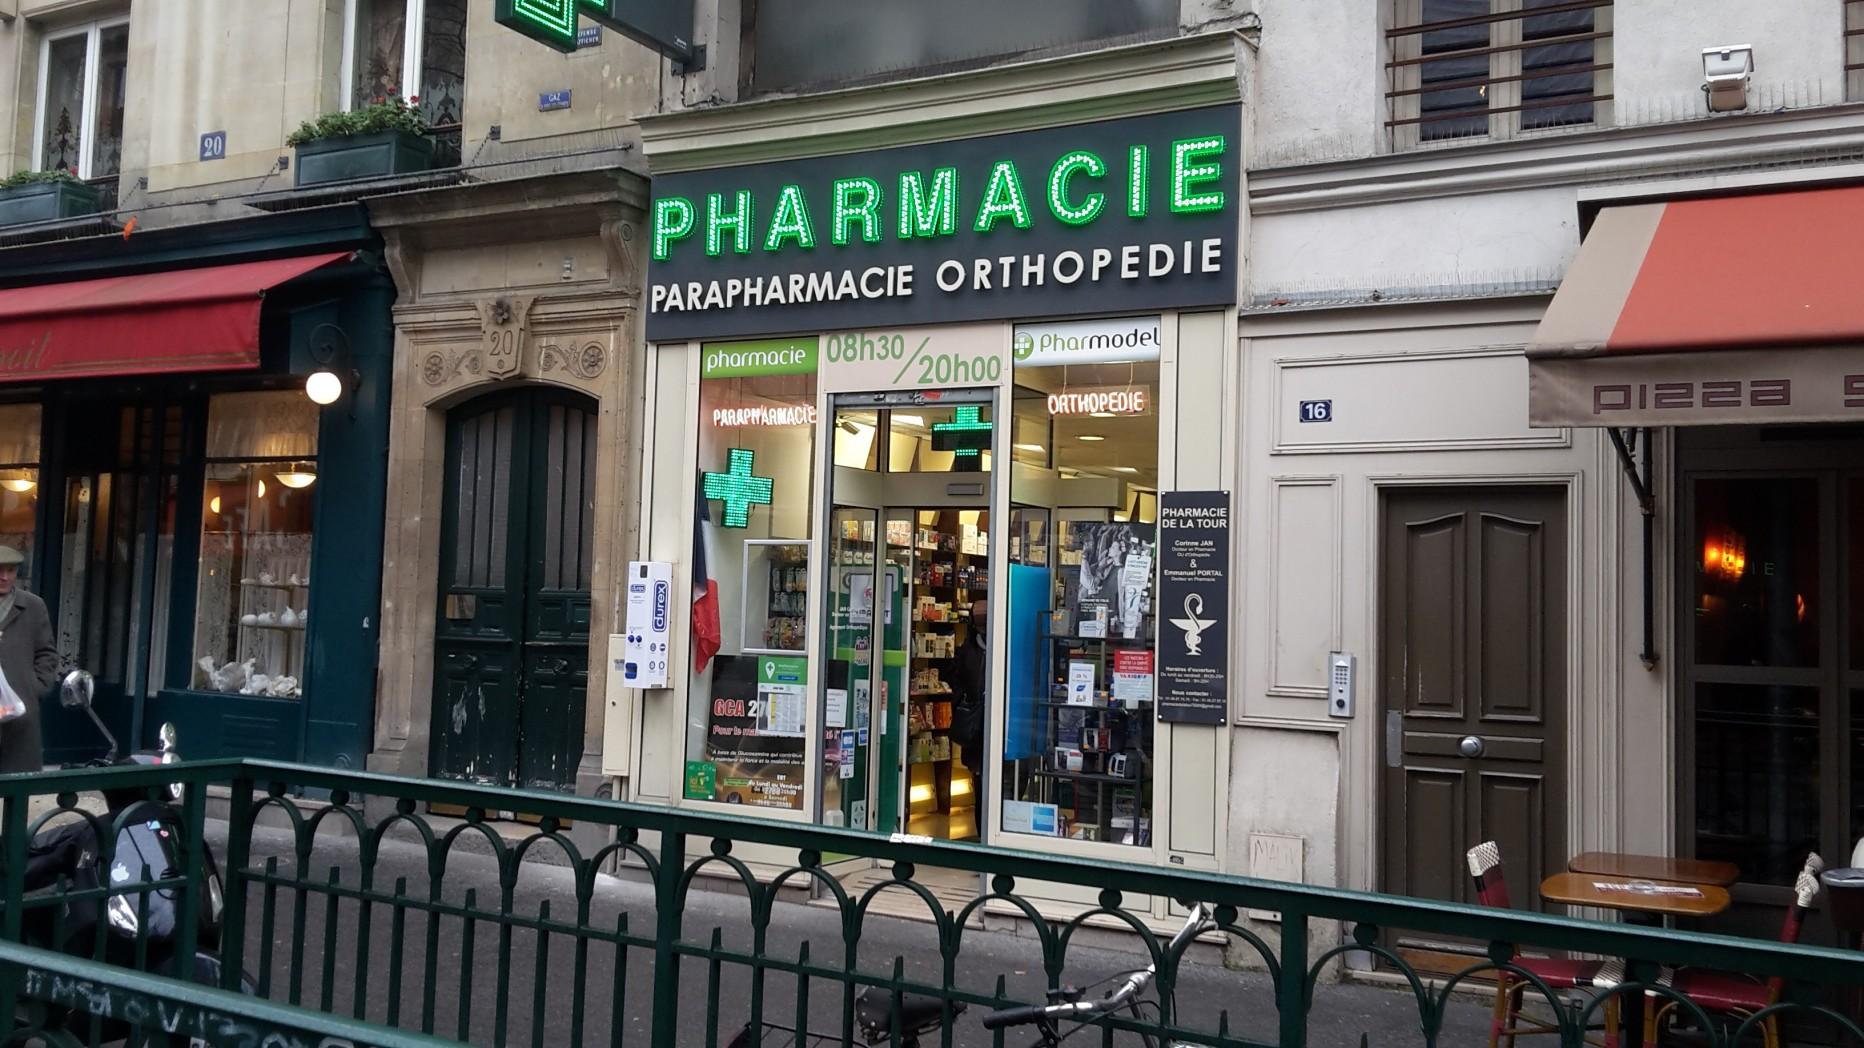 Pharmacie de la tour paris en m tro for Pharmacie de la piscine